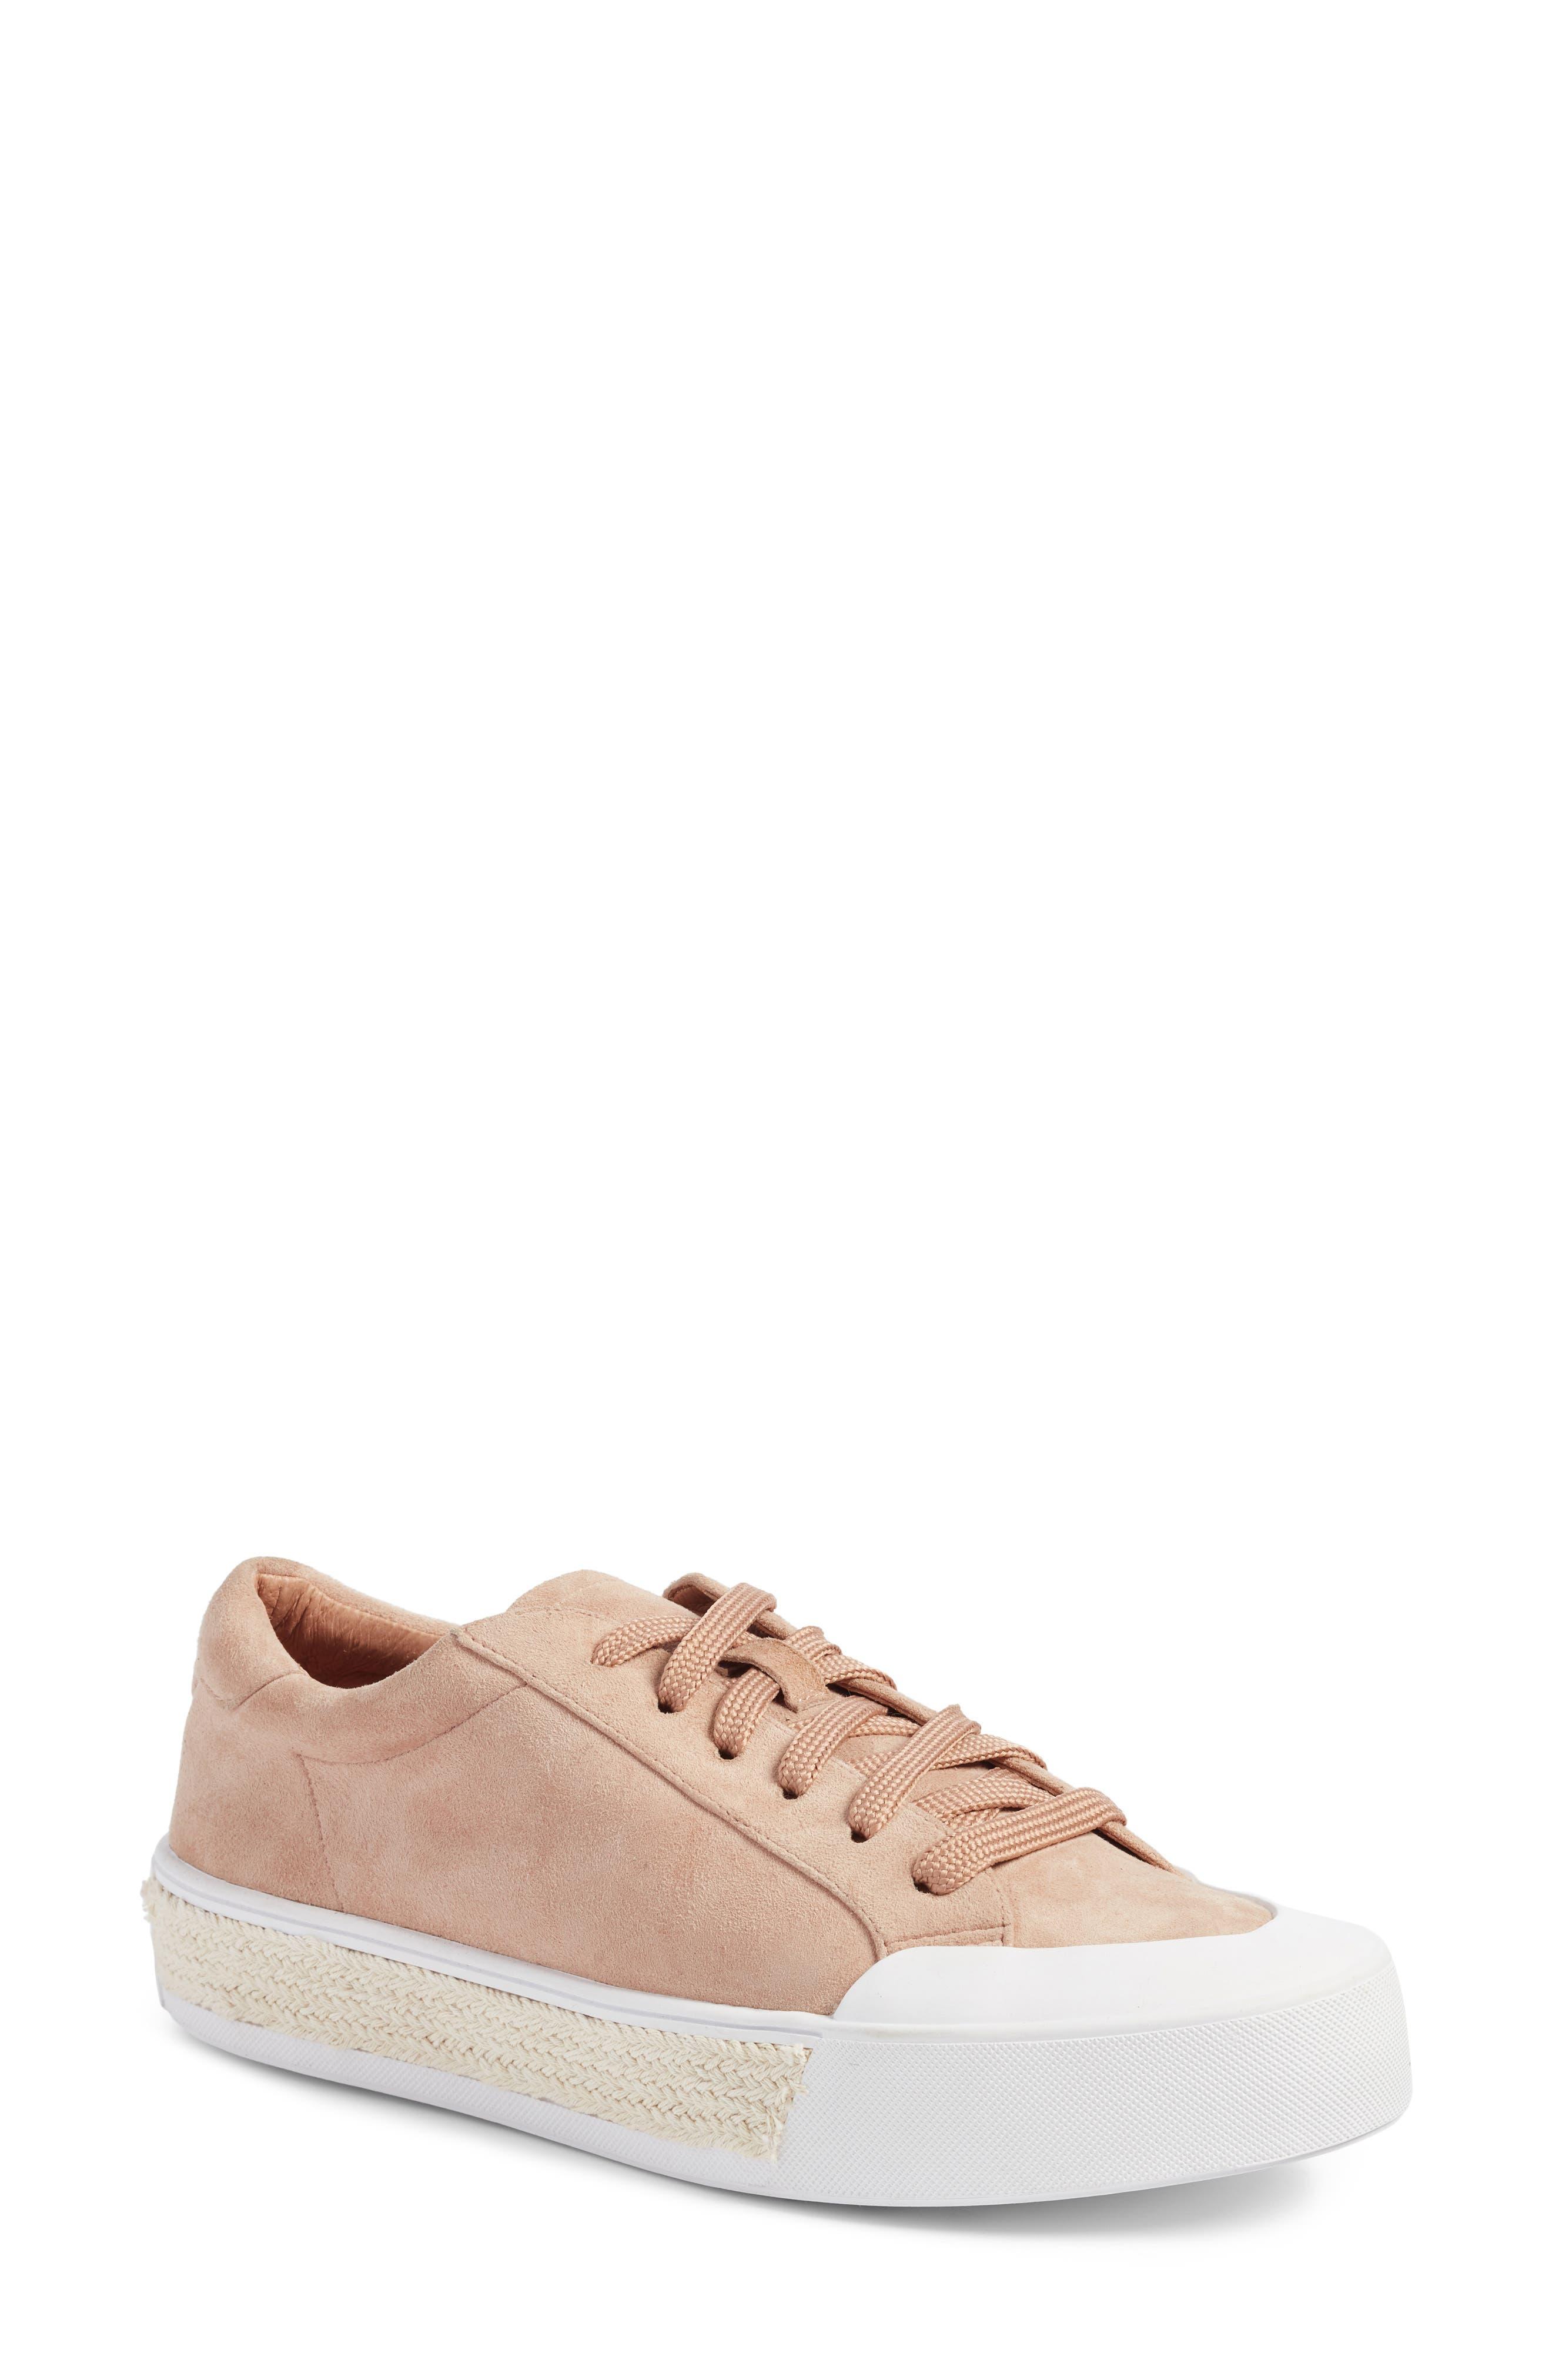 Toran Platform Sneaker,                         Main,                         color, Blush Suede